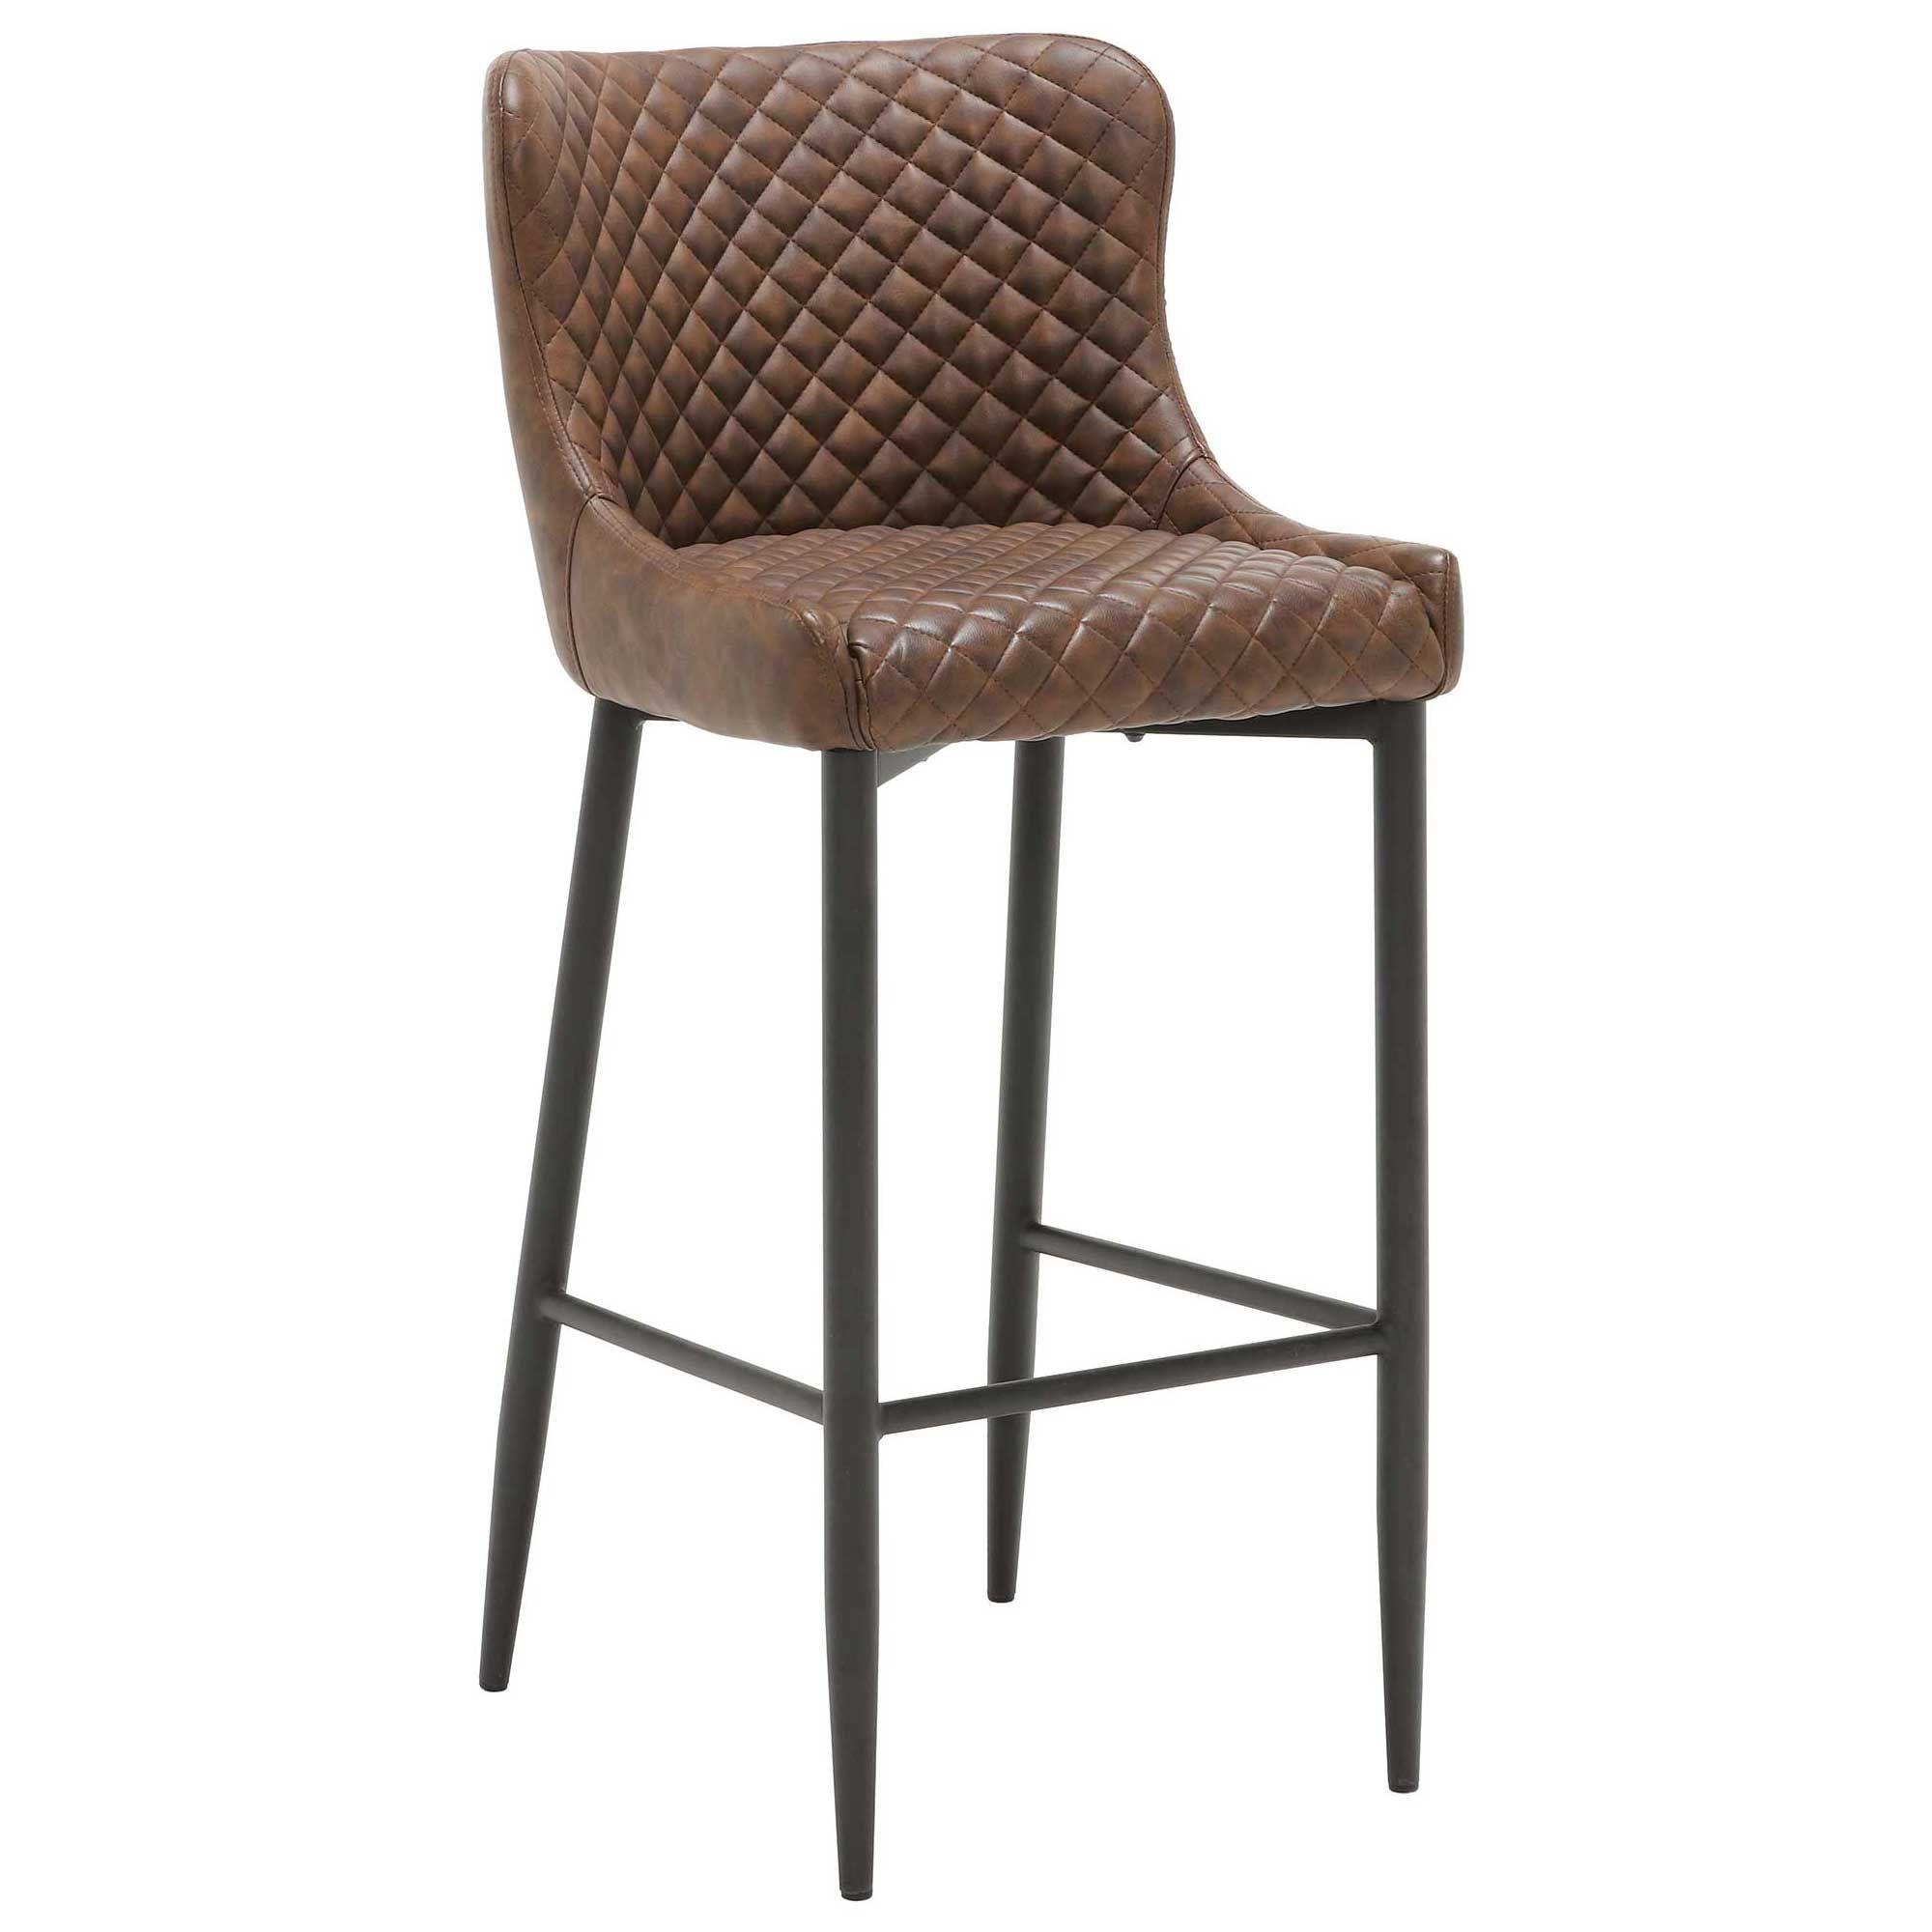 rivington faux leather kitchen bar stool  barker